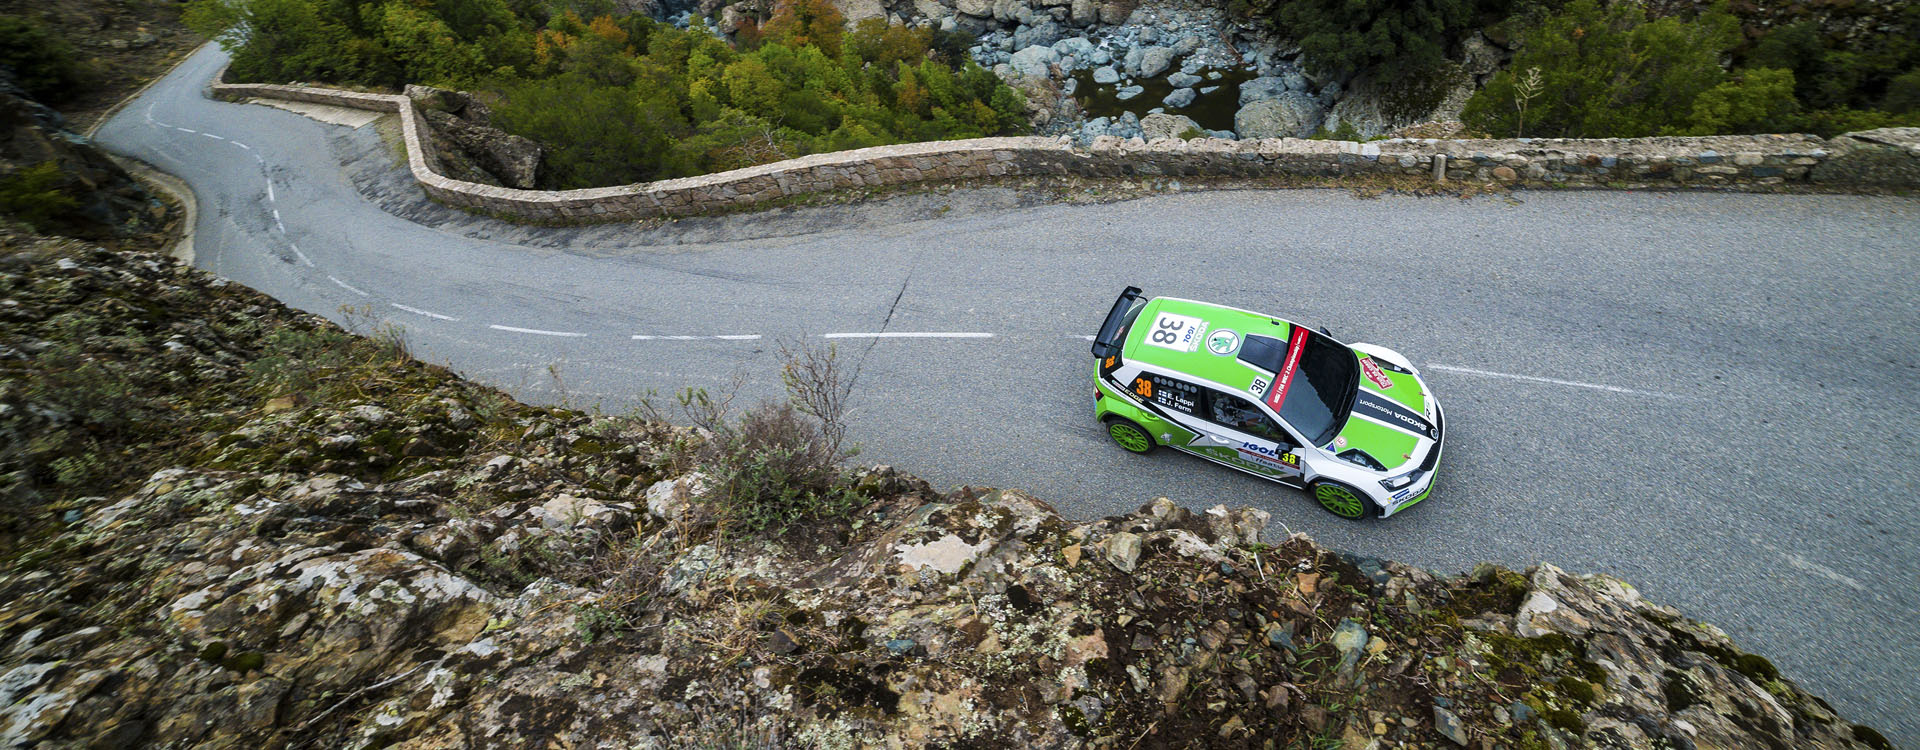 Tour de Corse: Rally of 10,000 corners